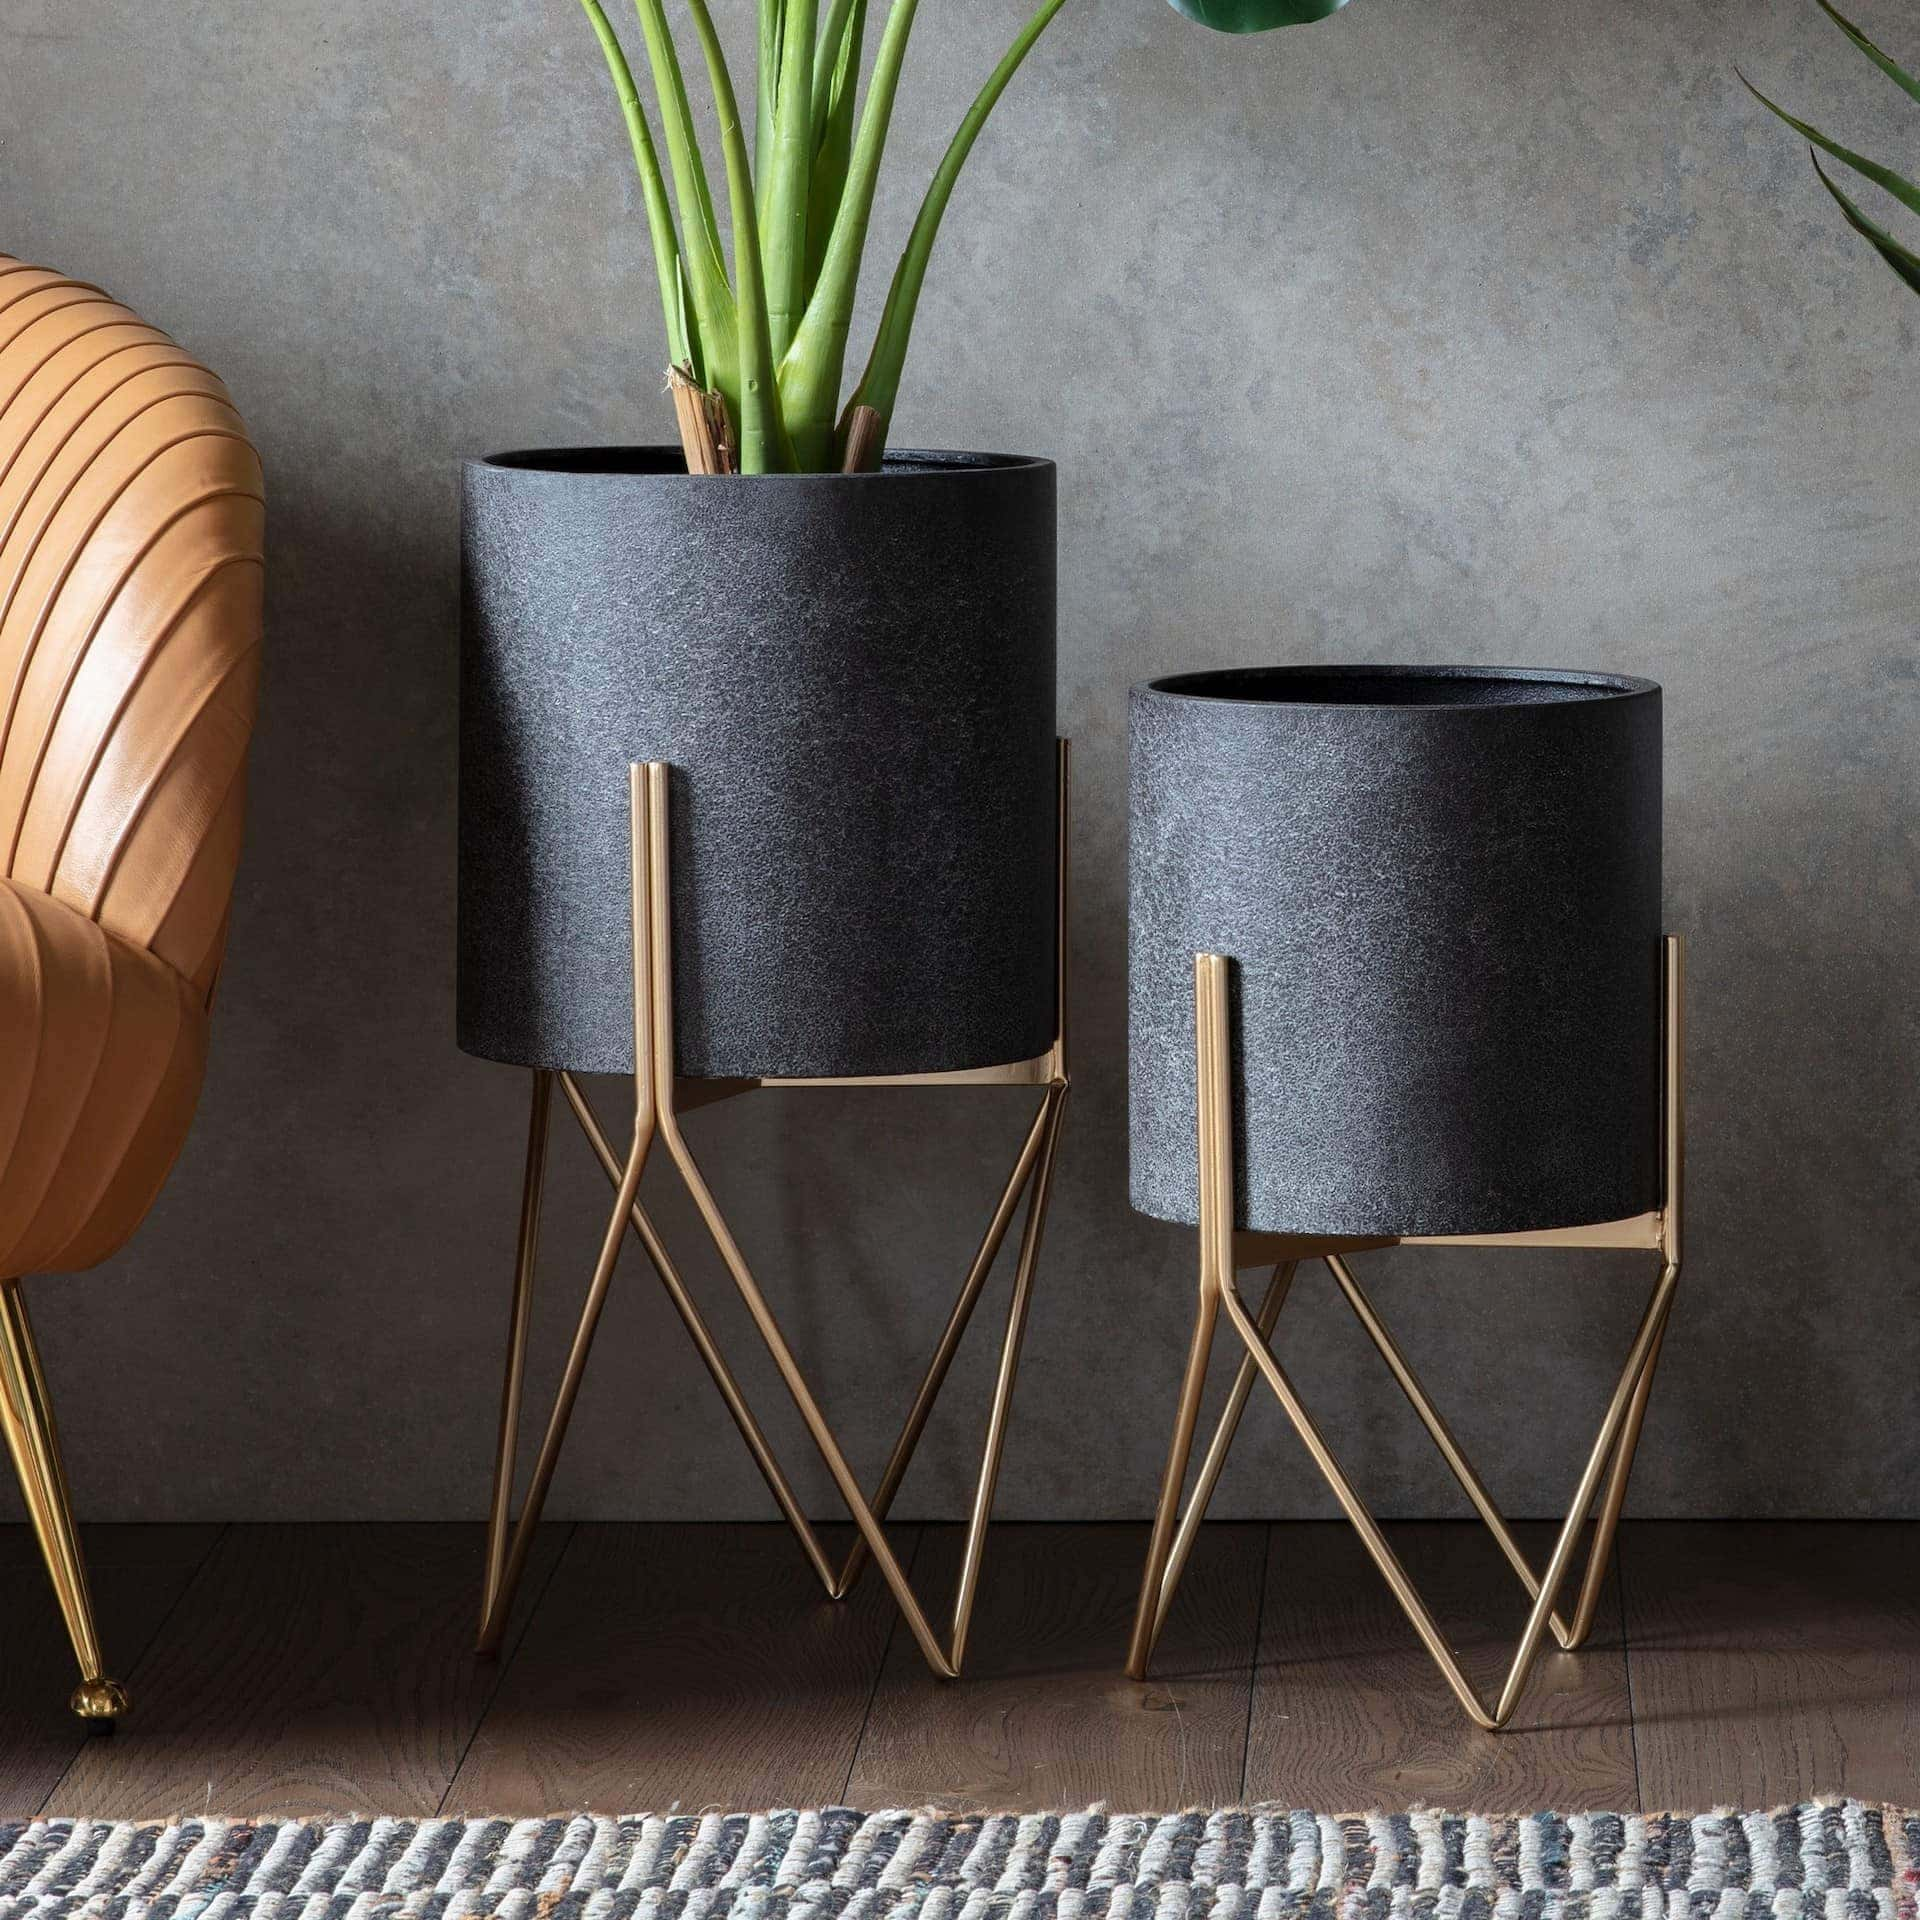 haston metal planter pots stand black indoor plant pot design metal leg